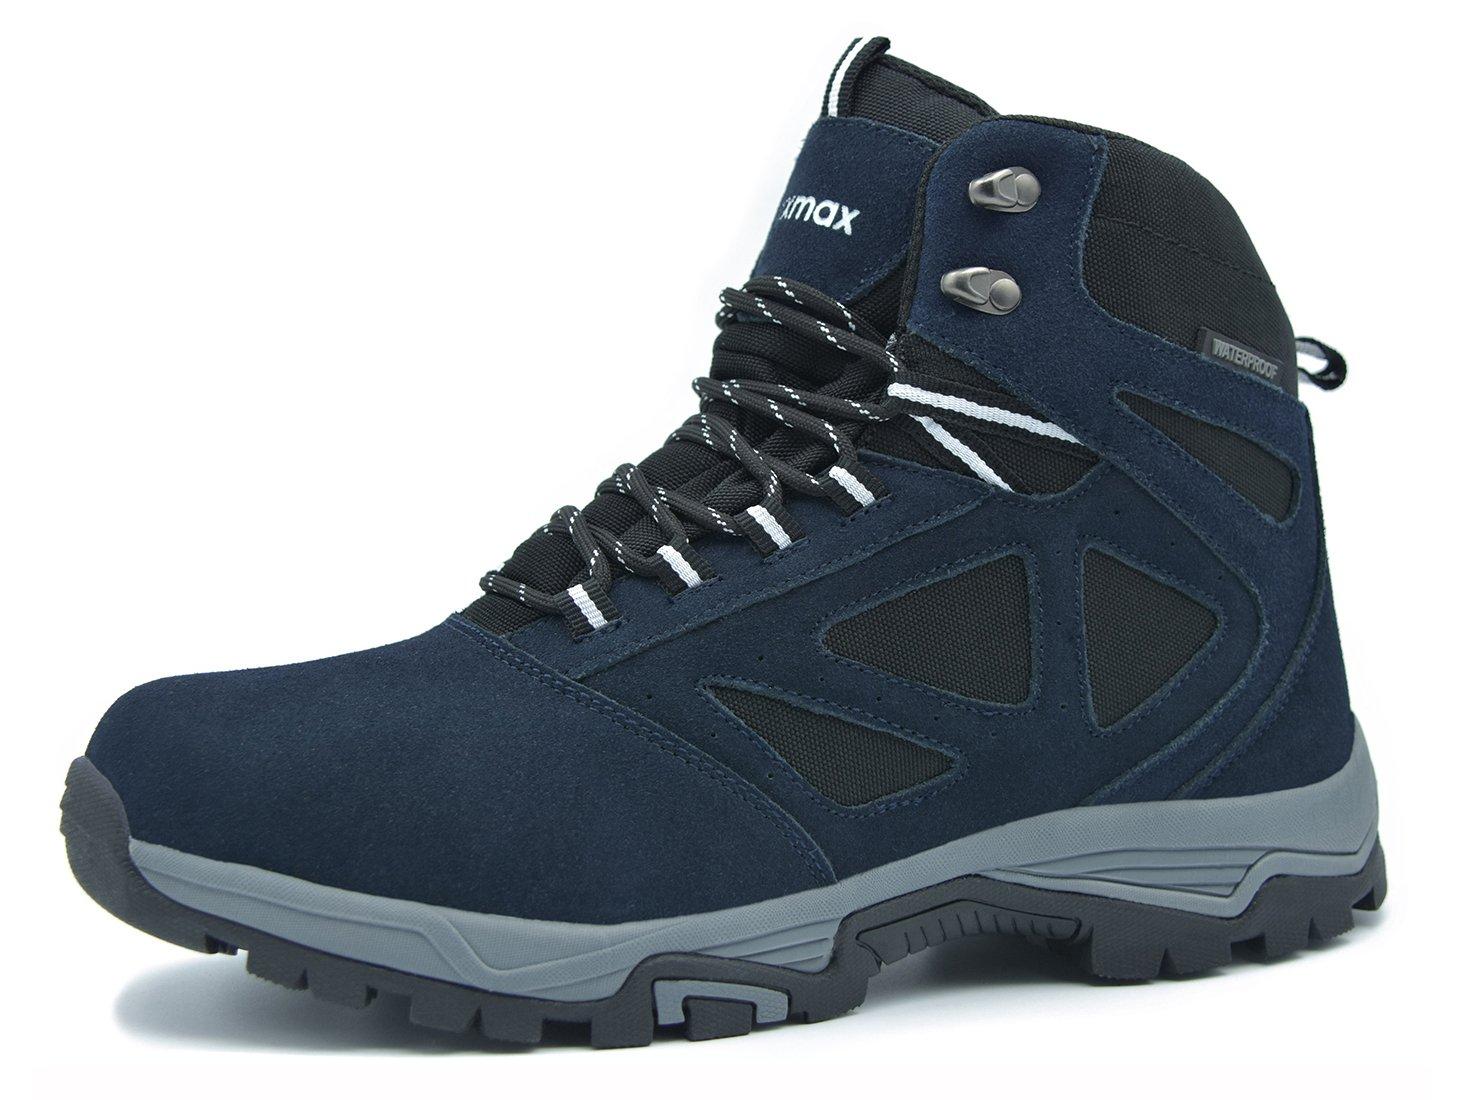 Kürbis Tag Adidas Winter warme Top Outdoor Wandern Schuhe